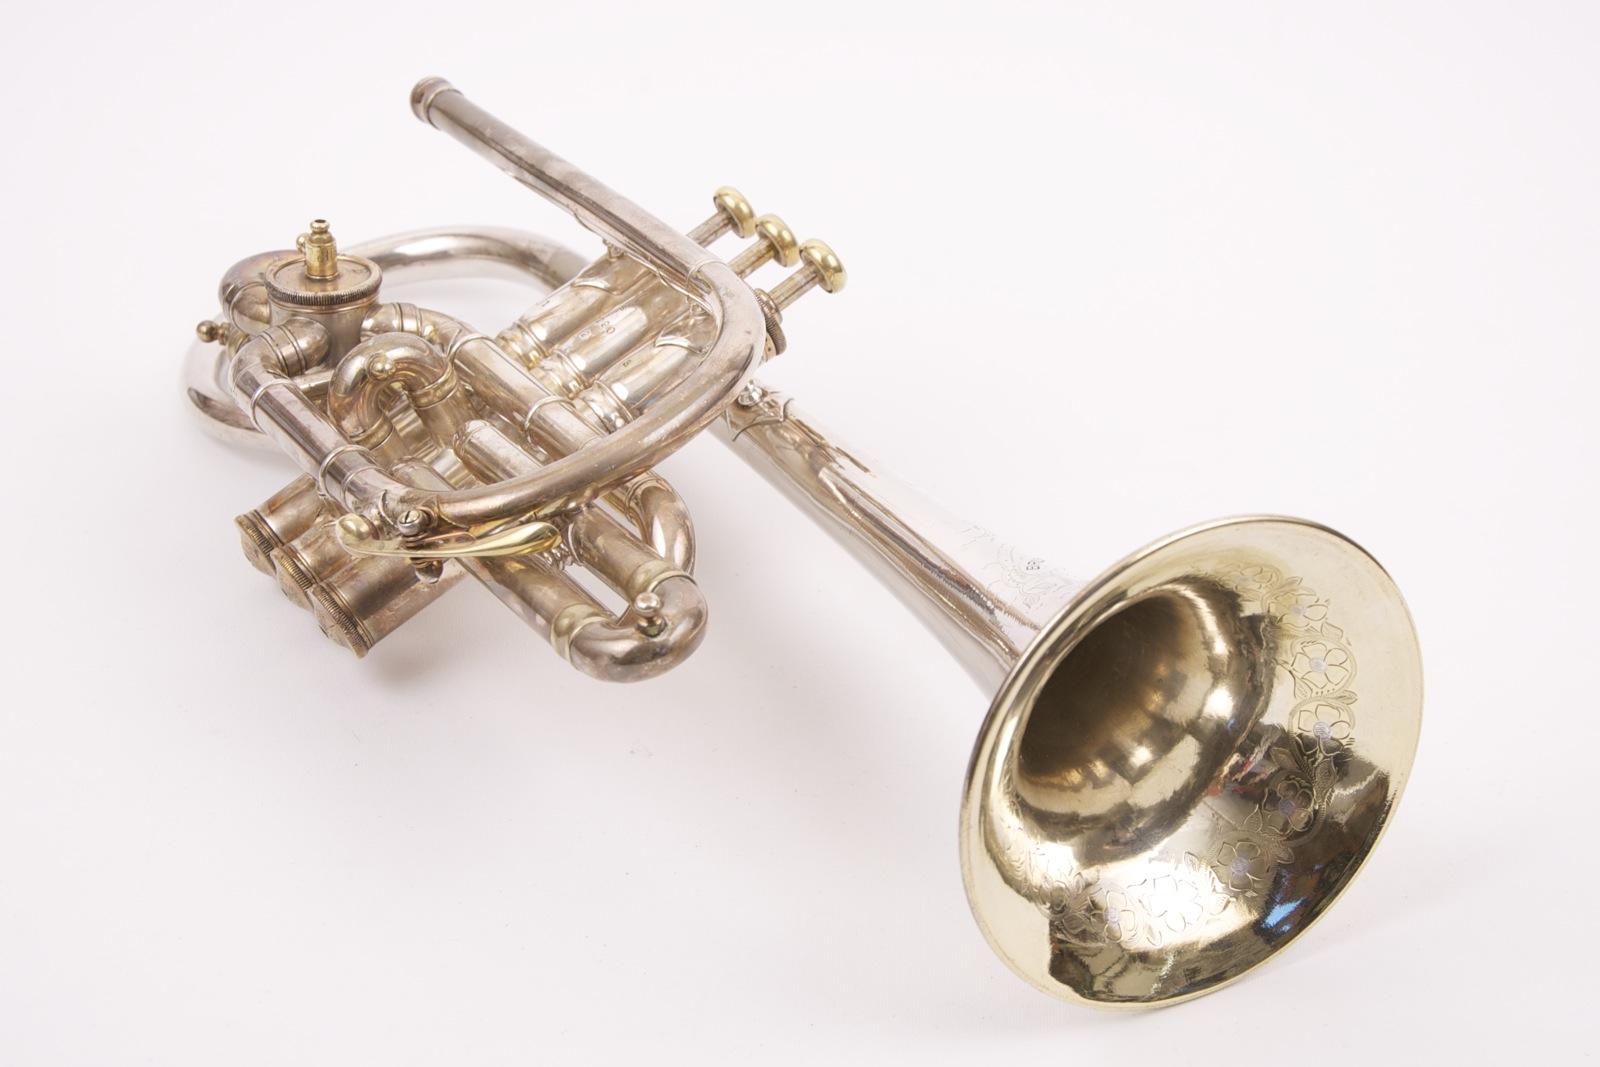 1335-cornet-C.-Keefer-05